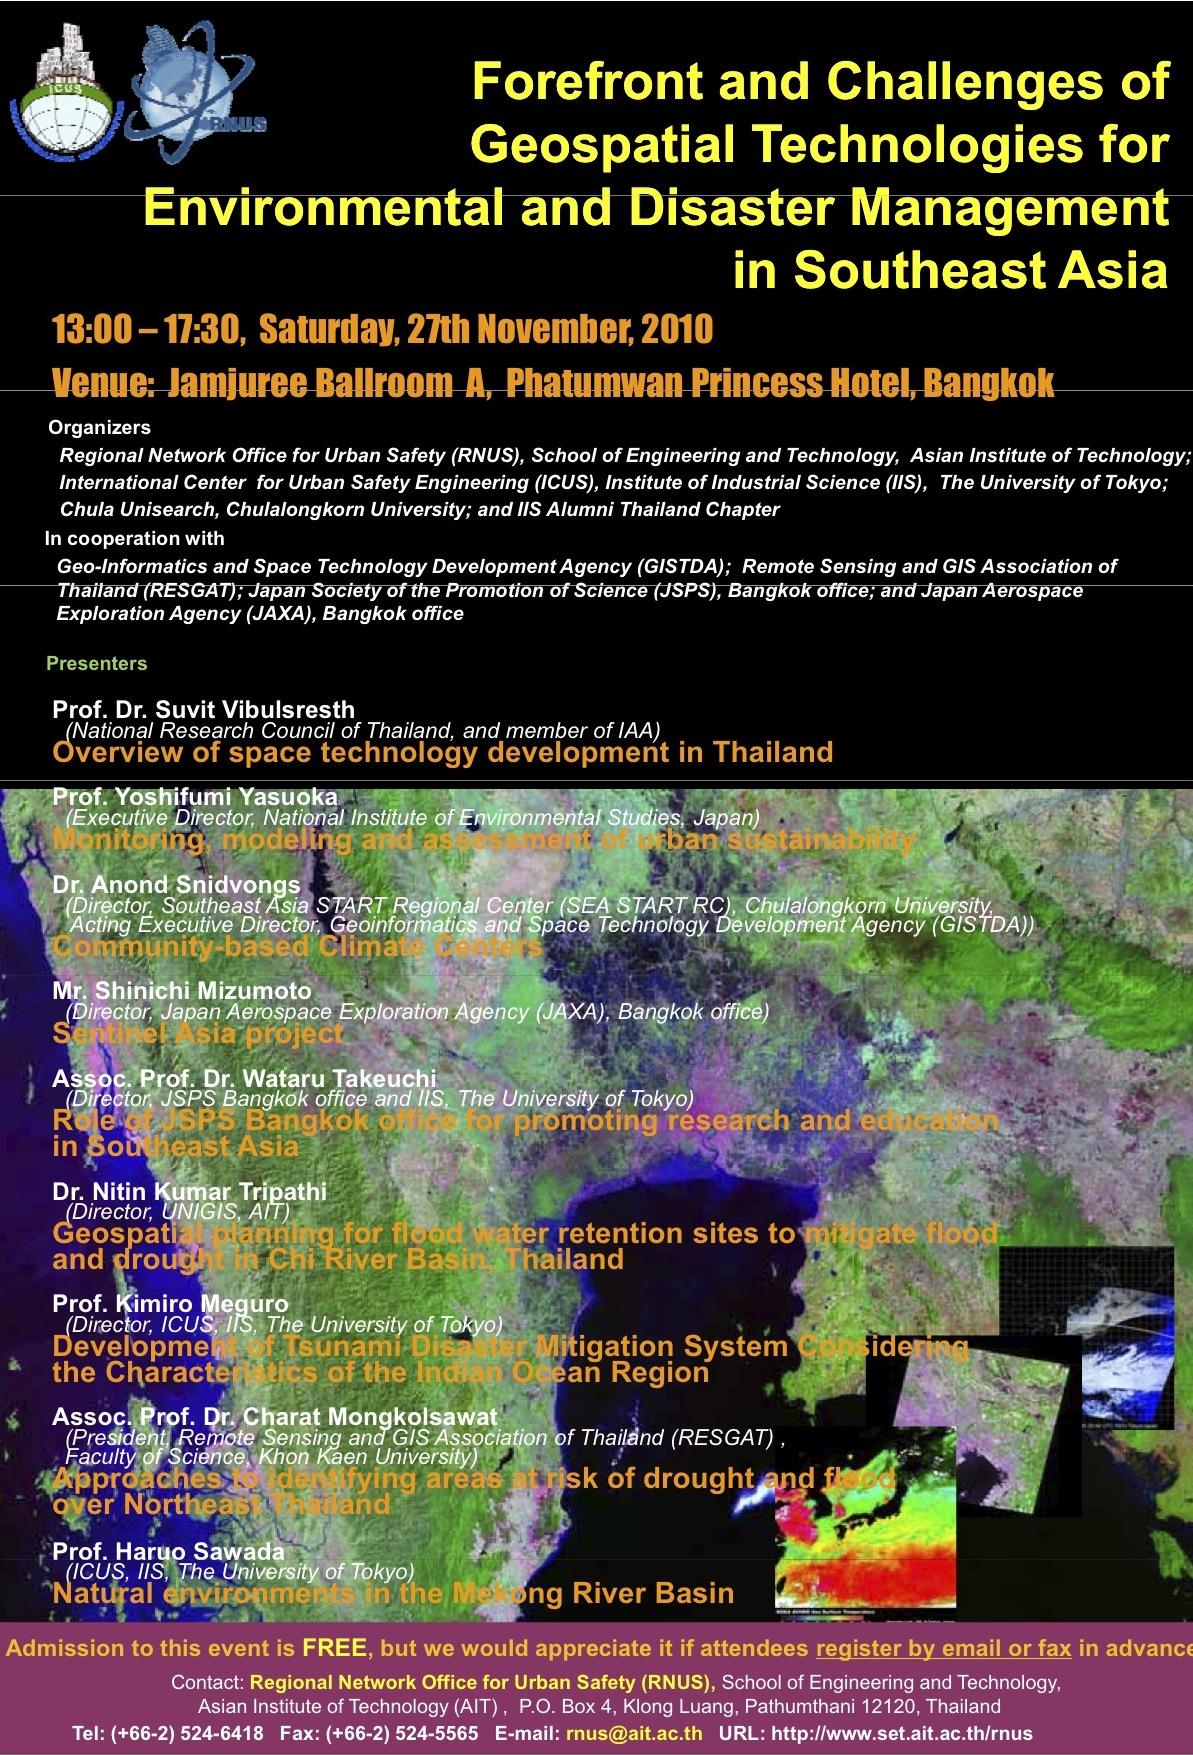 IIS_Seminars_2010_poster_simple